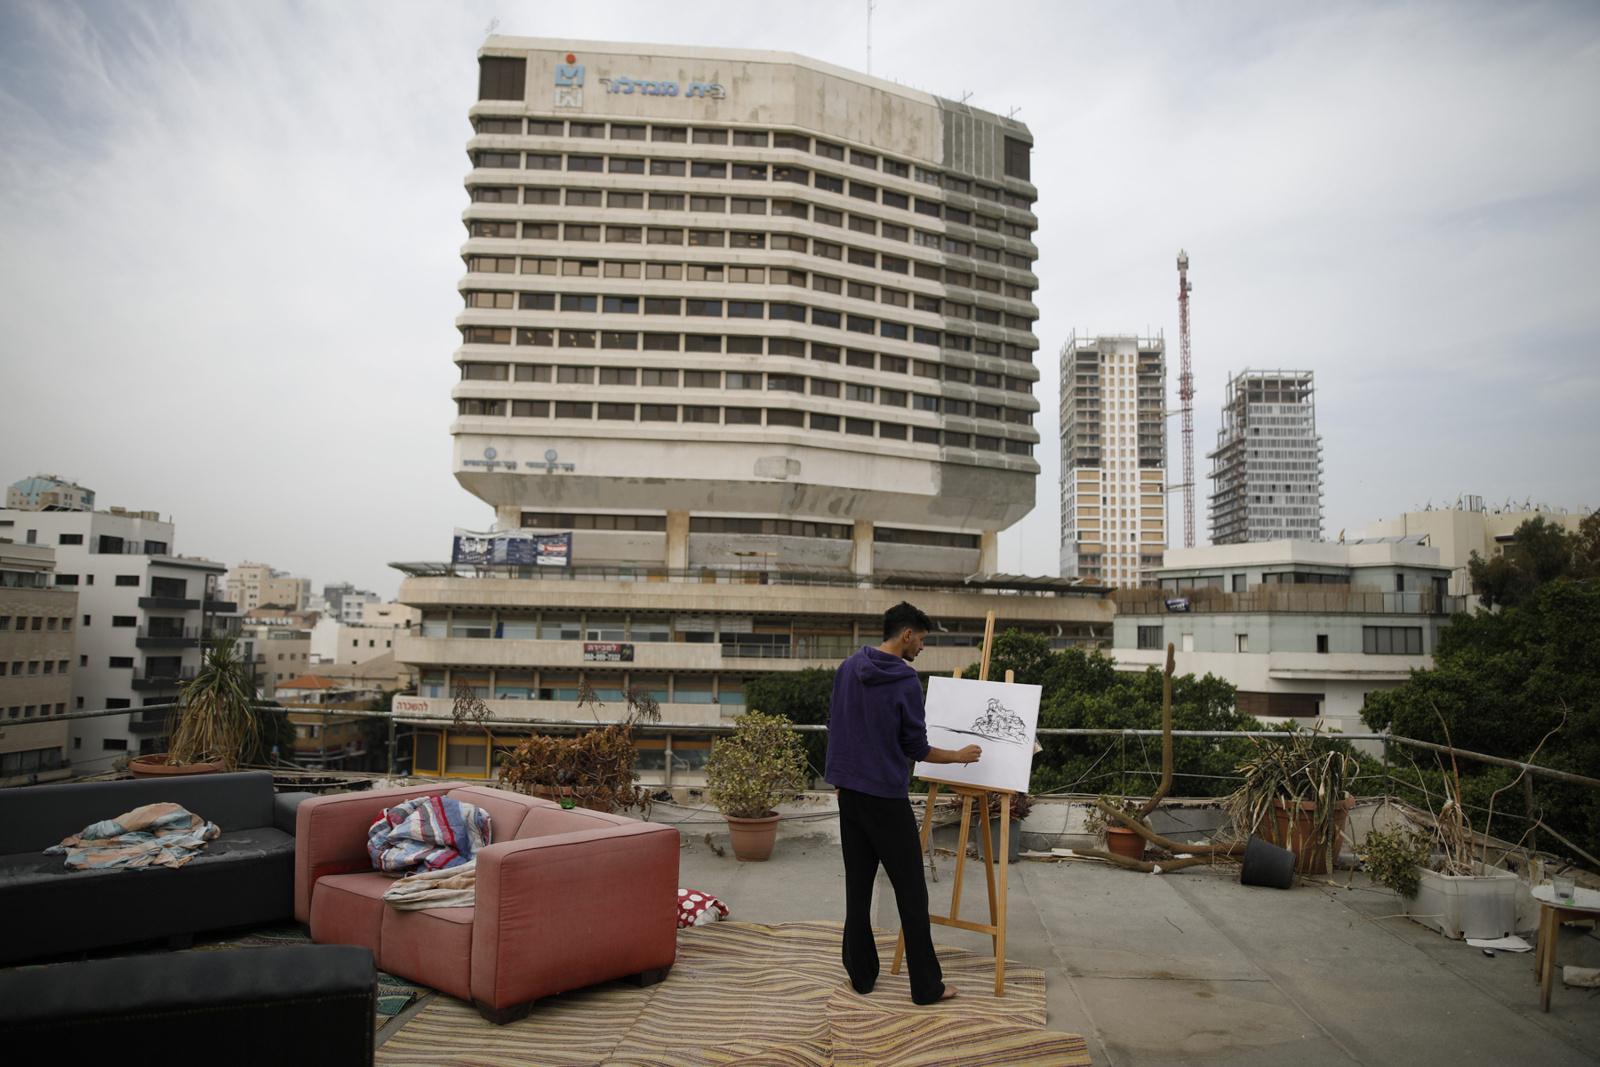 Hobby painter Kobi Malul, 31, paints on his rooftop in central Tel Aviv, November 13, 2017, Israel.